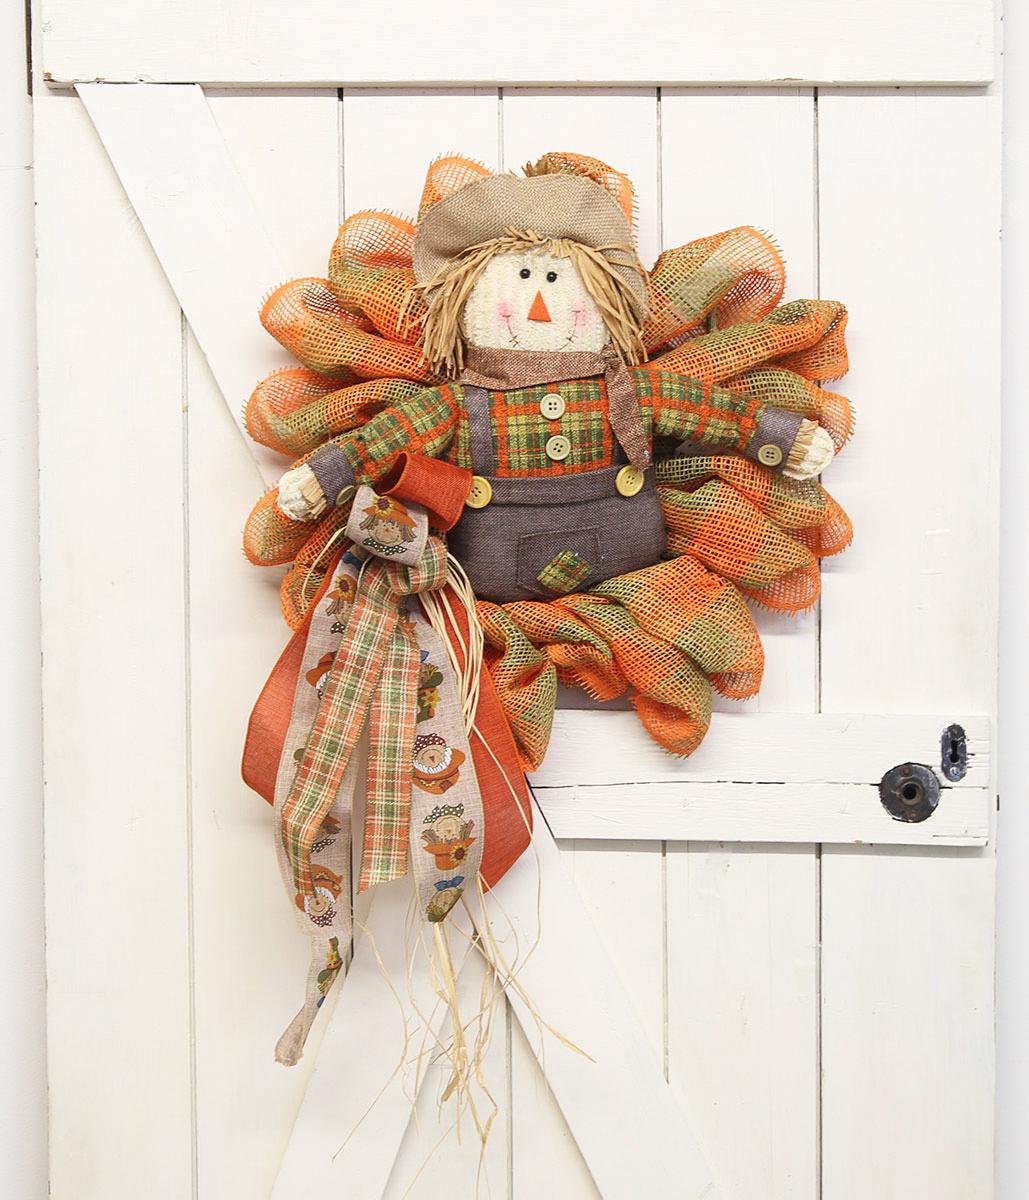 1_2020-DZC-ScarecrowDecoWreath